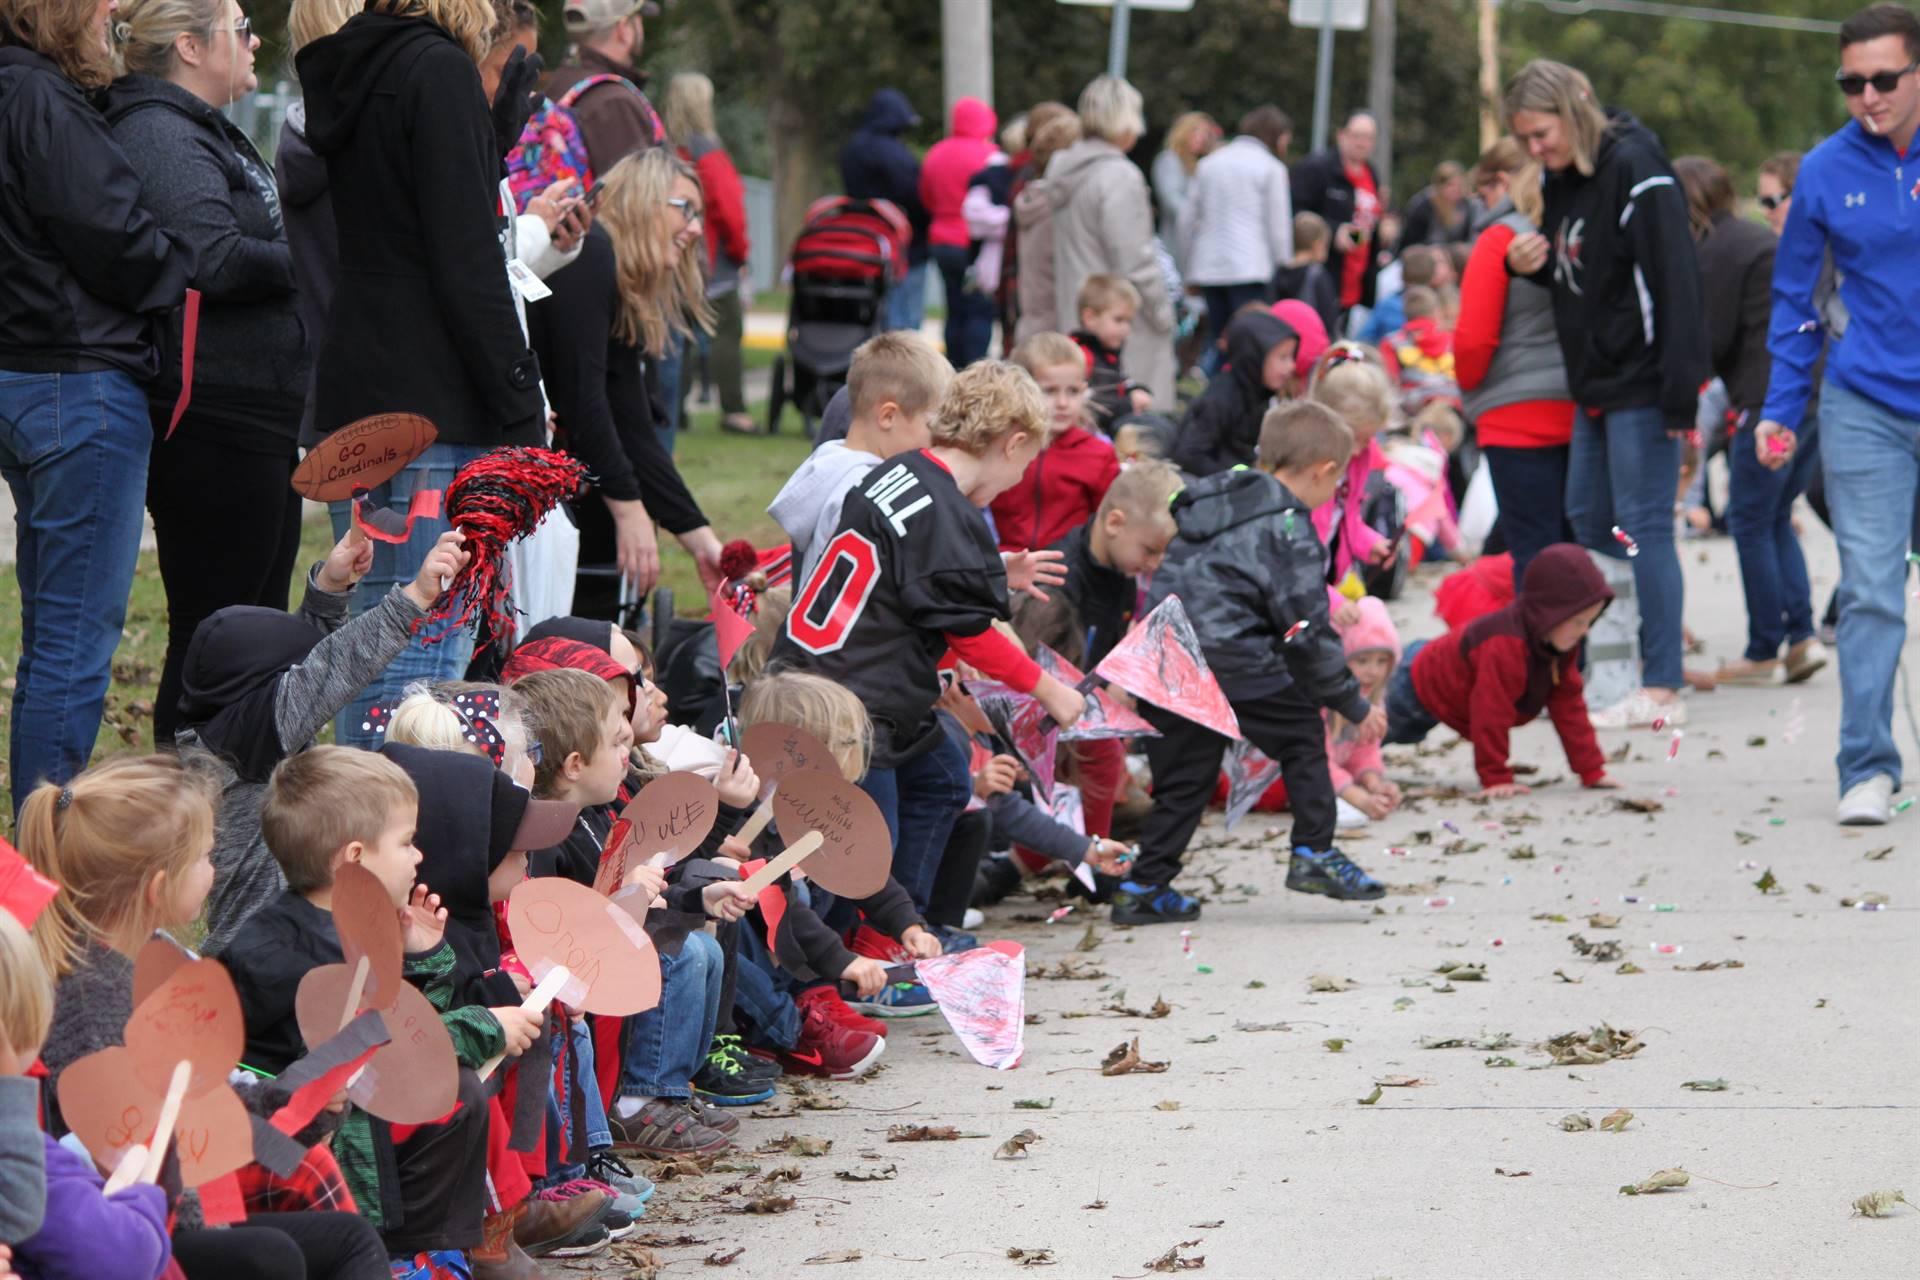 Students watching parade